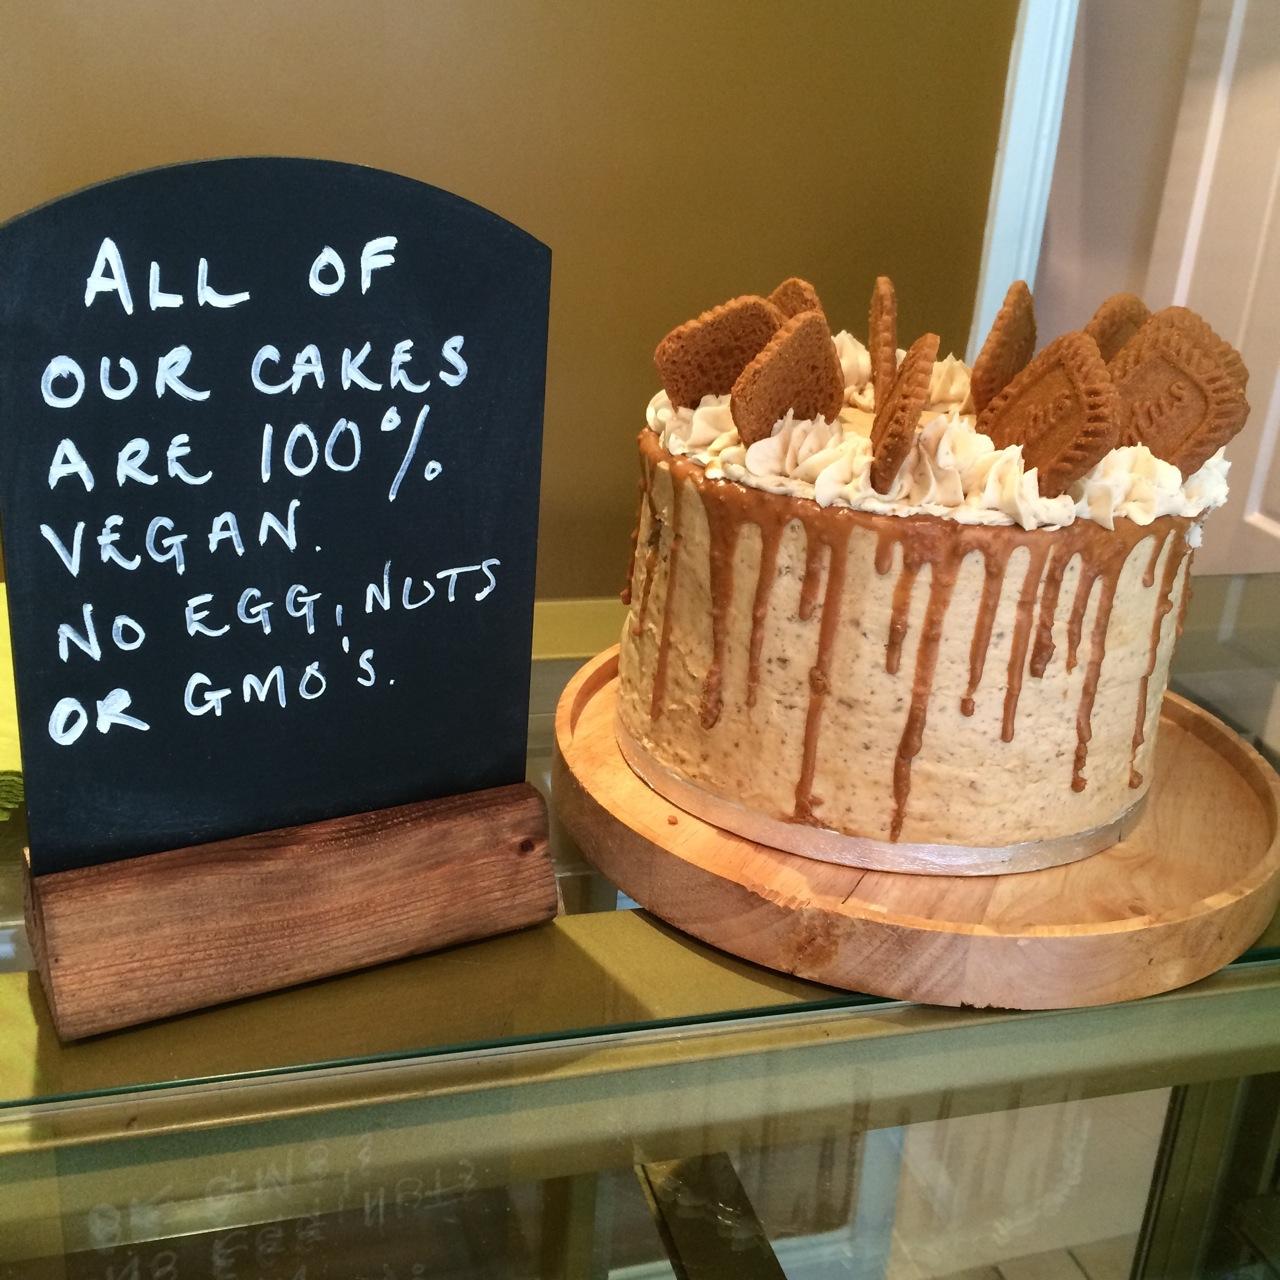 http://i1.wp.com/fatgayvegan.com/wp-content/uploads/2015/05/vegan-cake-and-sign.jpg?fit=1280%2C1280